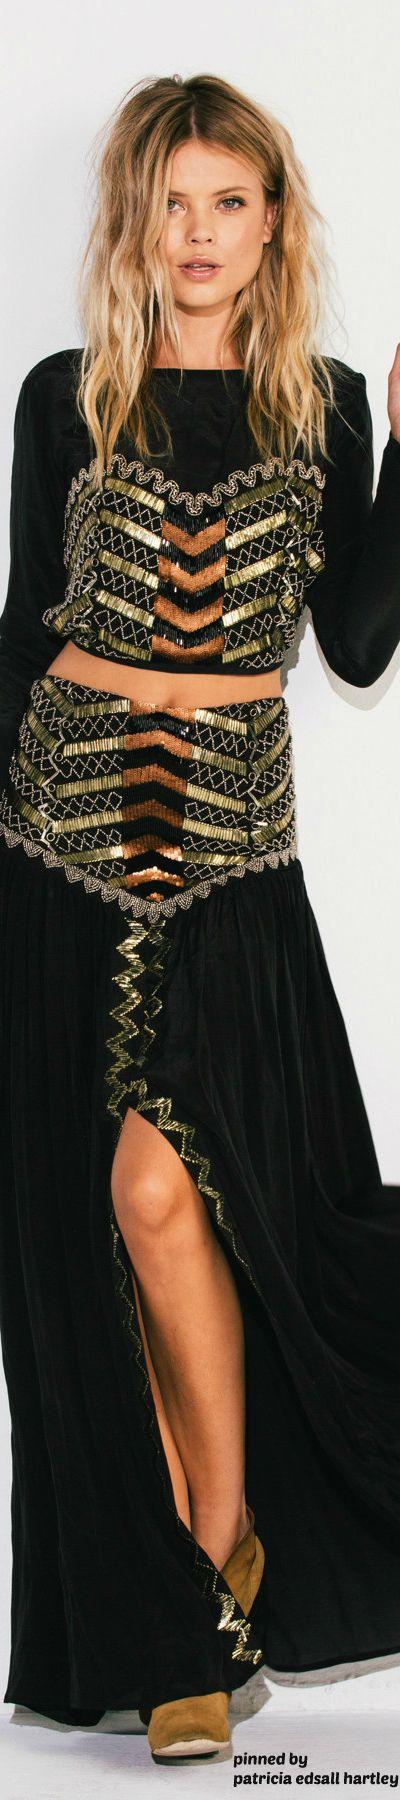 Chic Black Boho Midriff Top n' Skirt  ≫∙∙☮ Bohème Babe ☮∙∙≪• ❤️ Babz™ ✿ιиѕριяαтισи❀ #abbigliamento #bohojewelry #boho